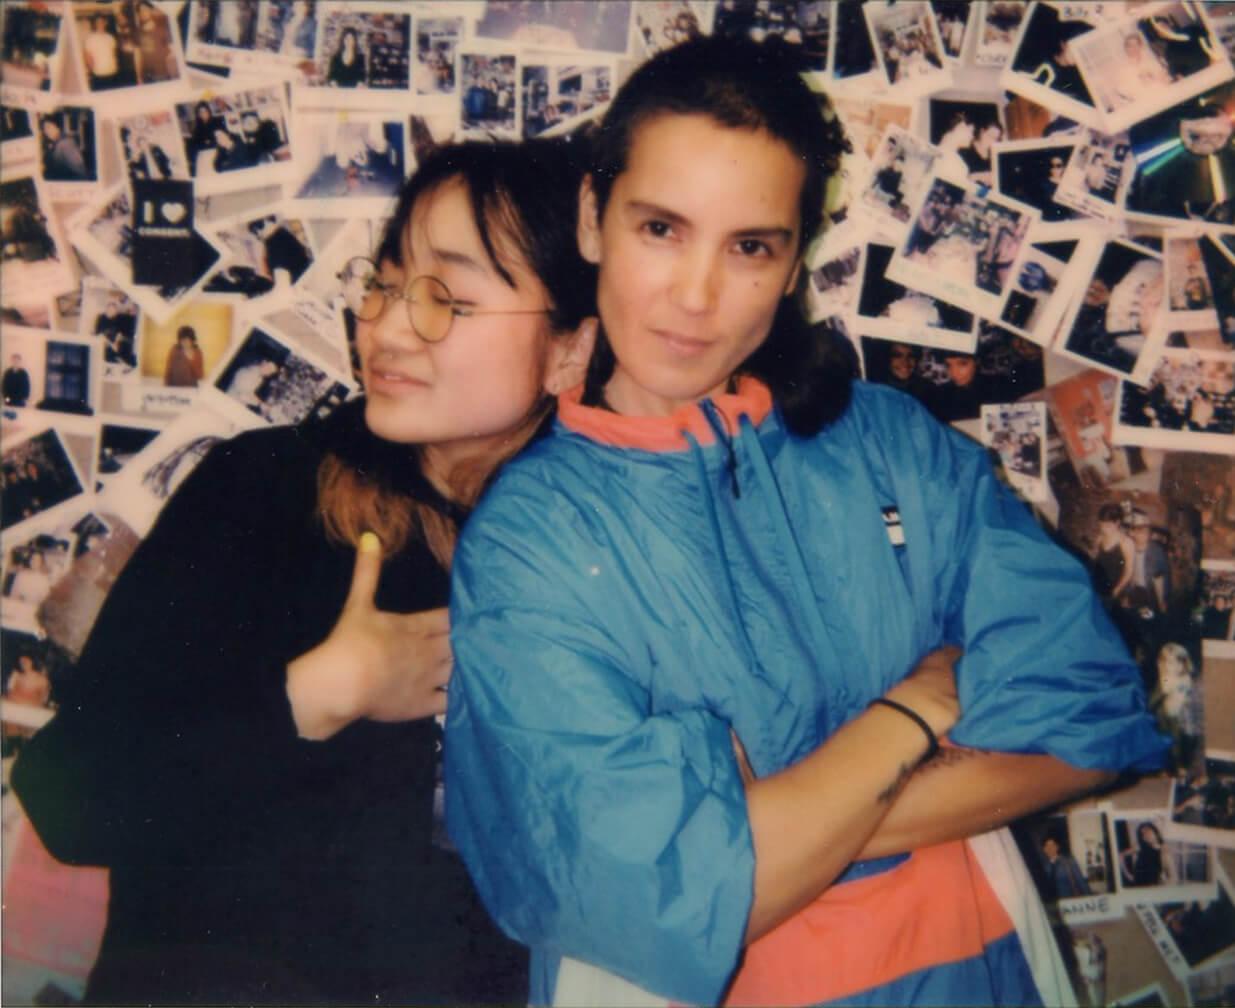 BIS Radio Show #944 with Yaeji and Kim Ann Foxman